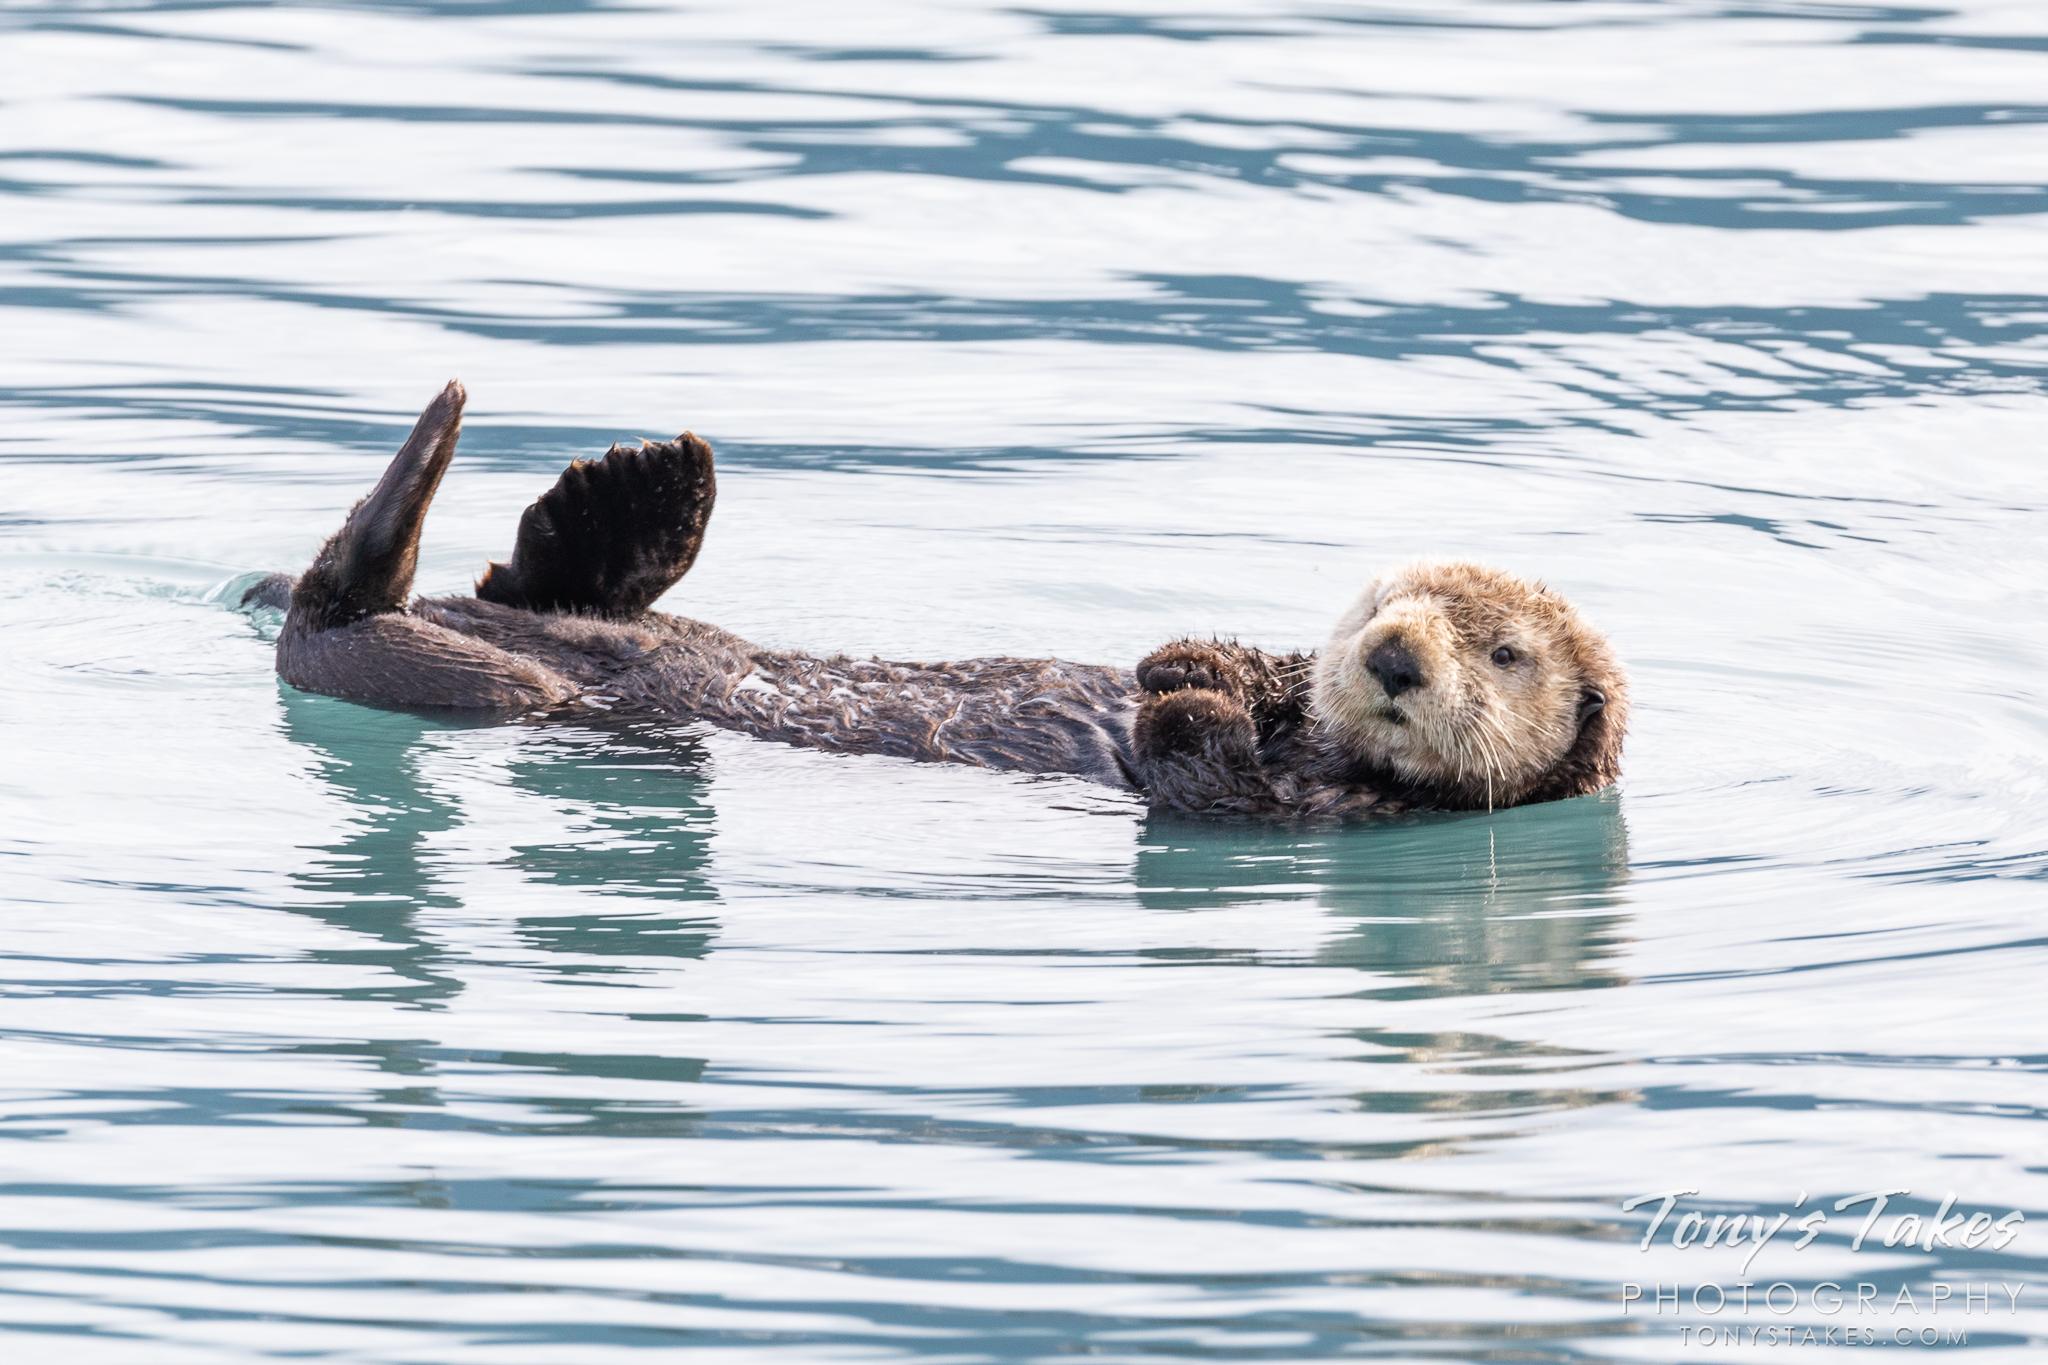 Sea otter brings smiles